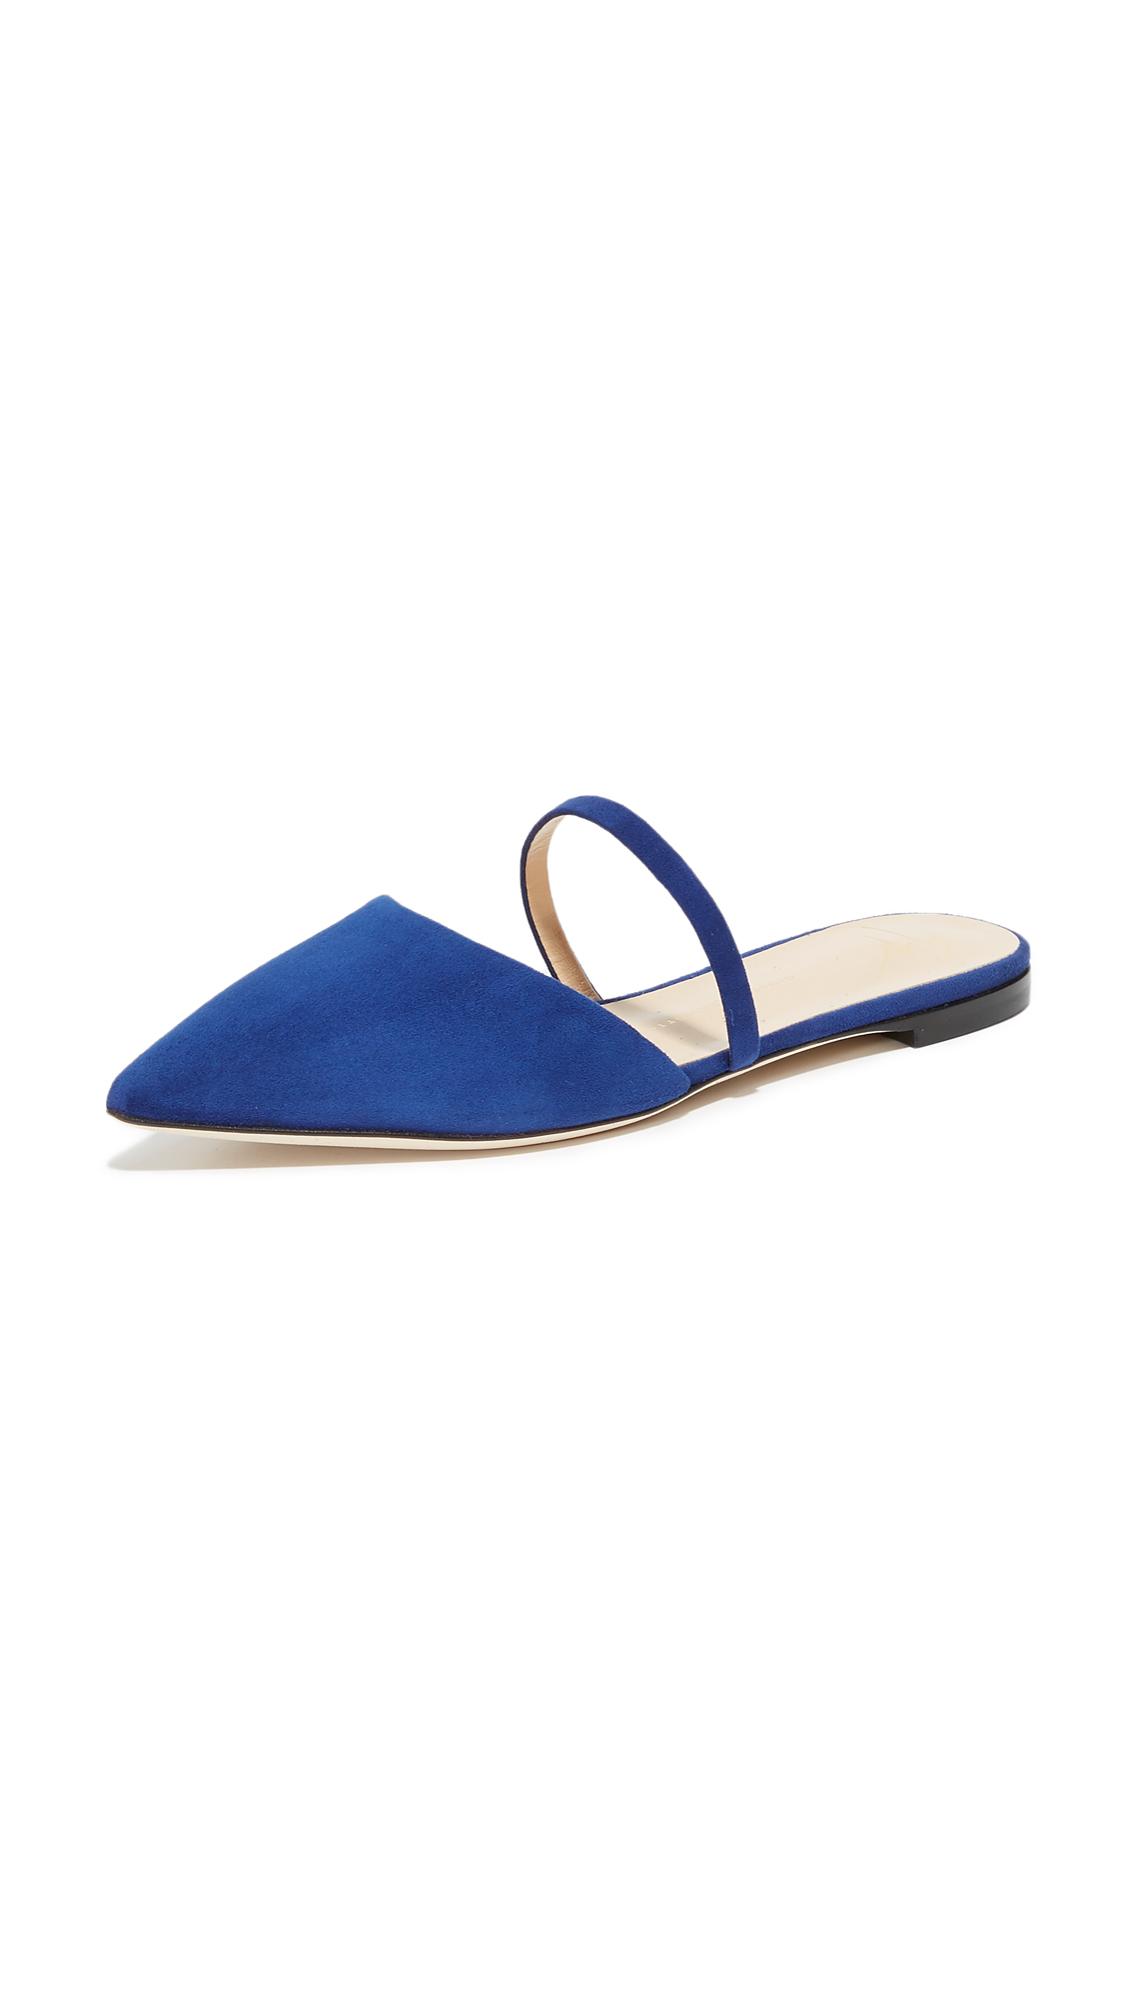 Giuseppe Zanotti Flat Slides - Blue